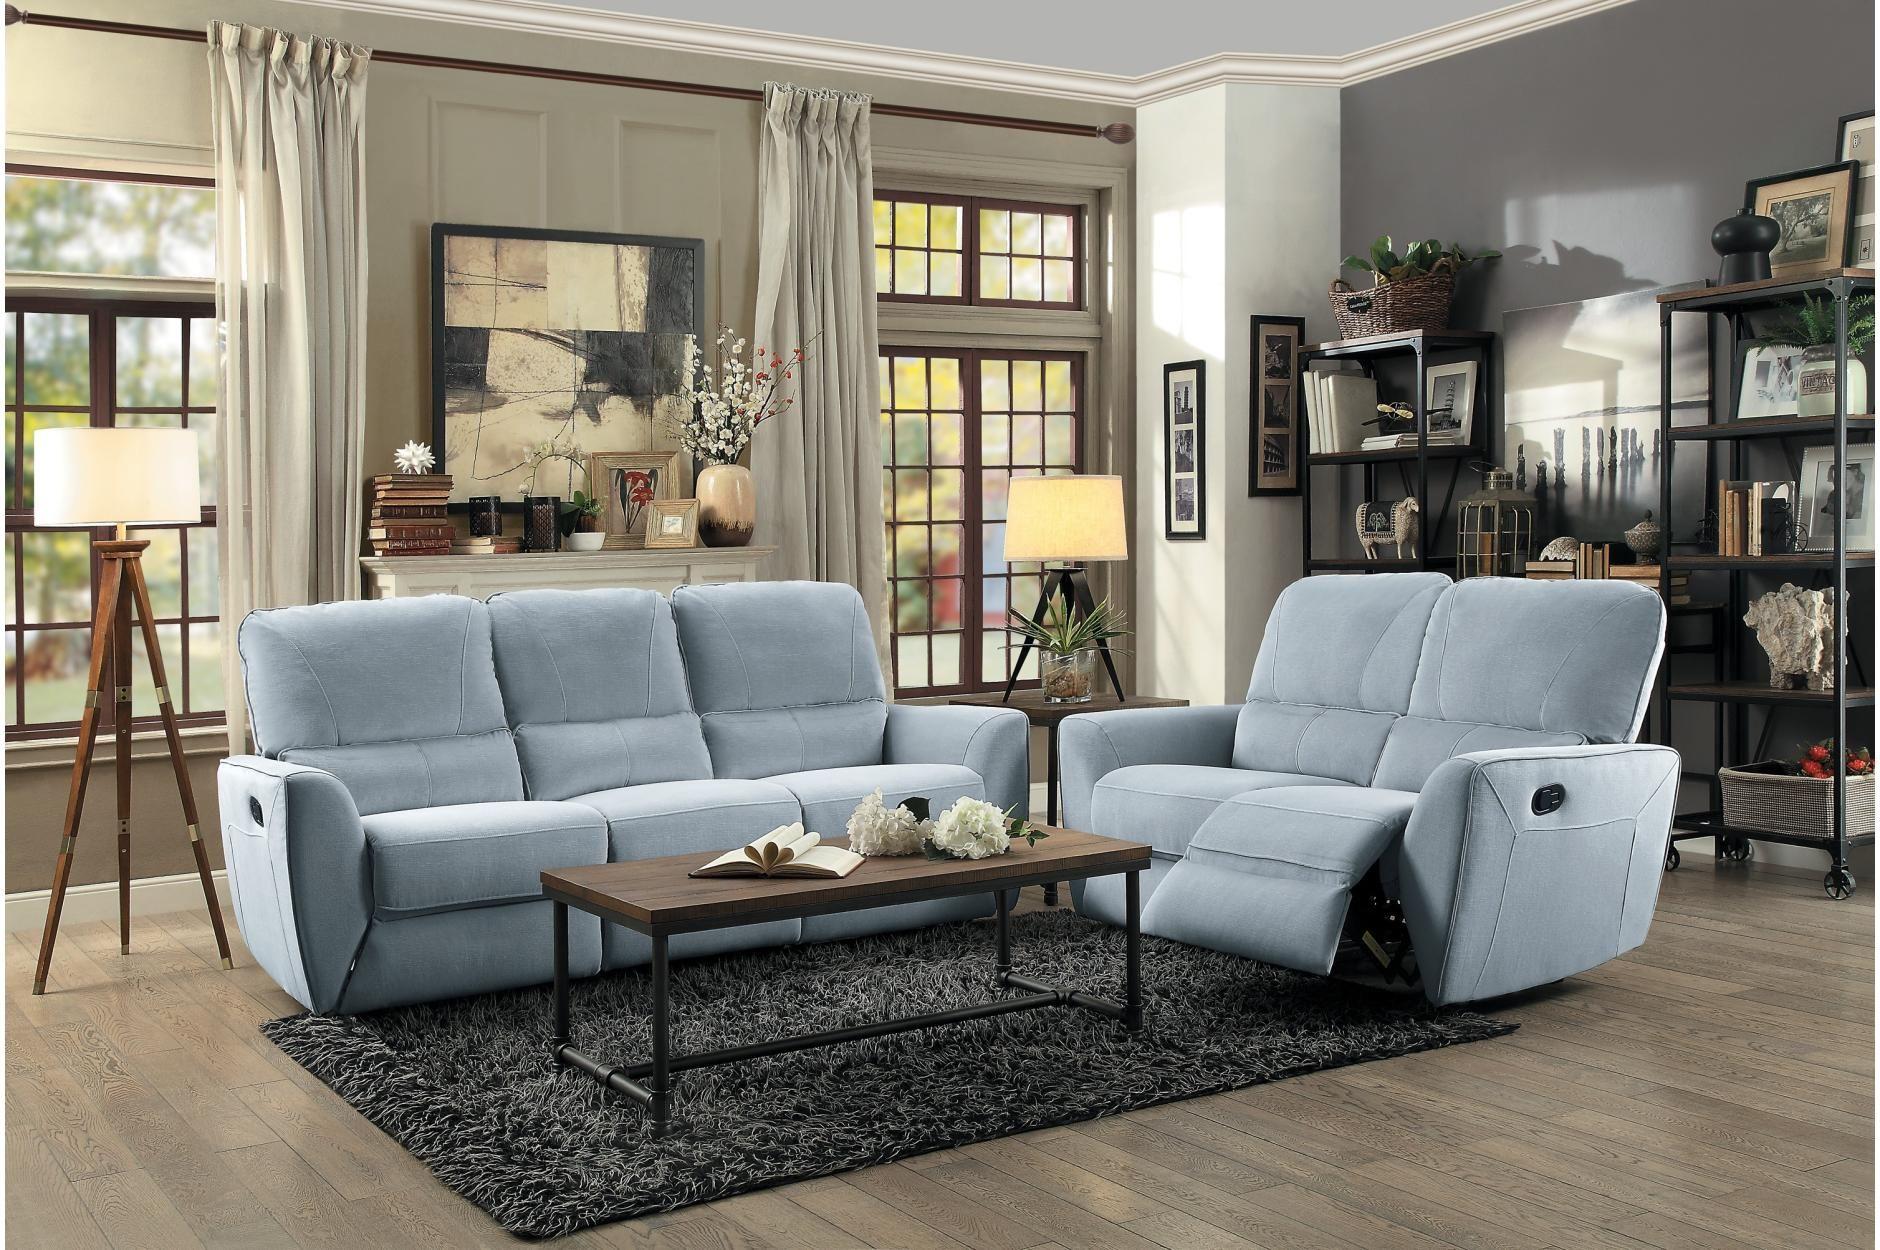 Fabric Upholstered Plush Cushioned Dual Recliner Sofa Casagear Sofa Homedecor Homelov Living Room Sets Living Room Leather Living Room Upholstery #suede #living #room #set